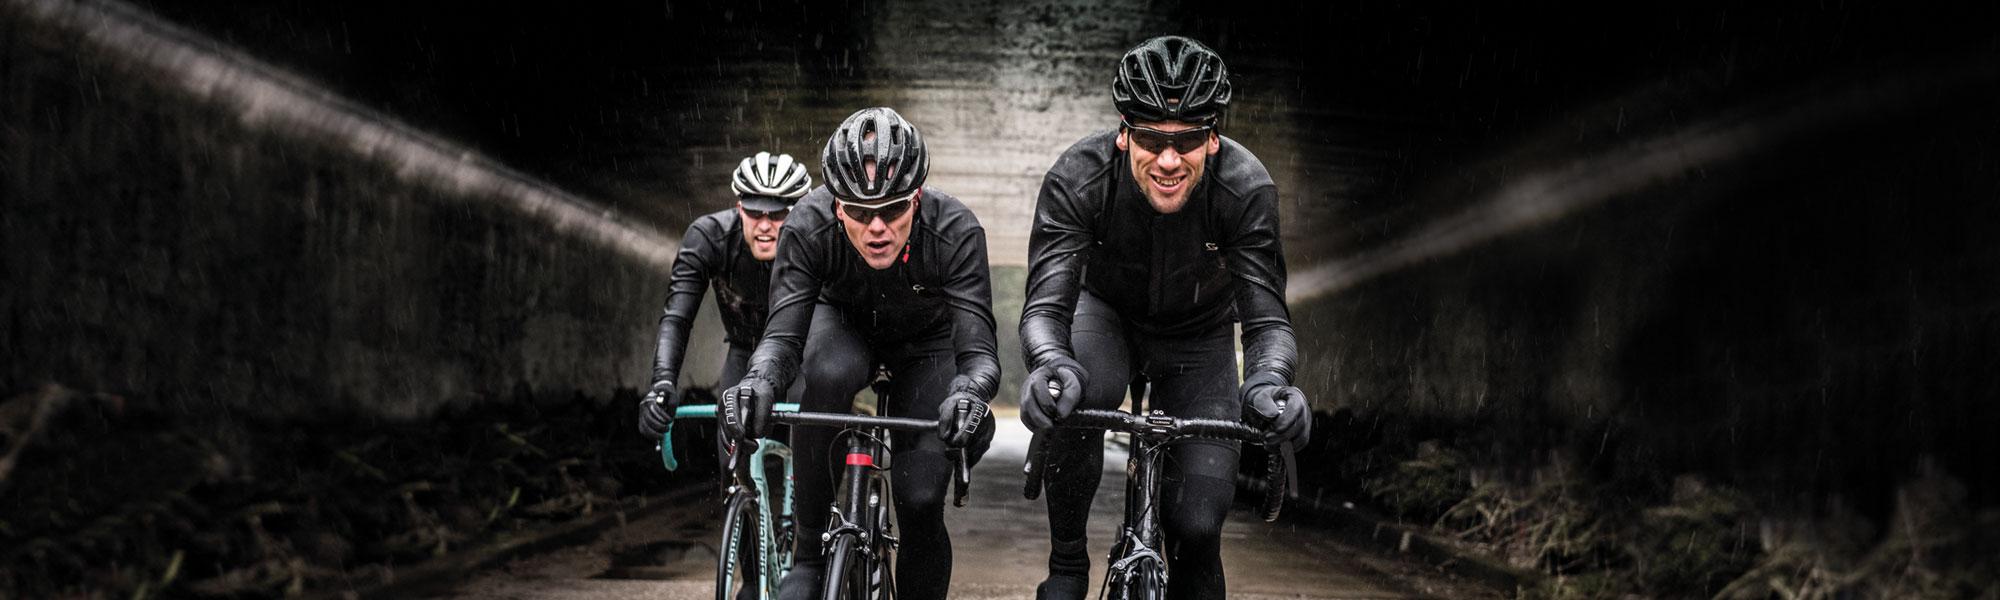 Futurum Quality Gear The High End Dutch Cycling Wear Brand